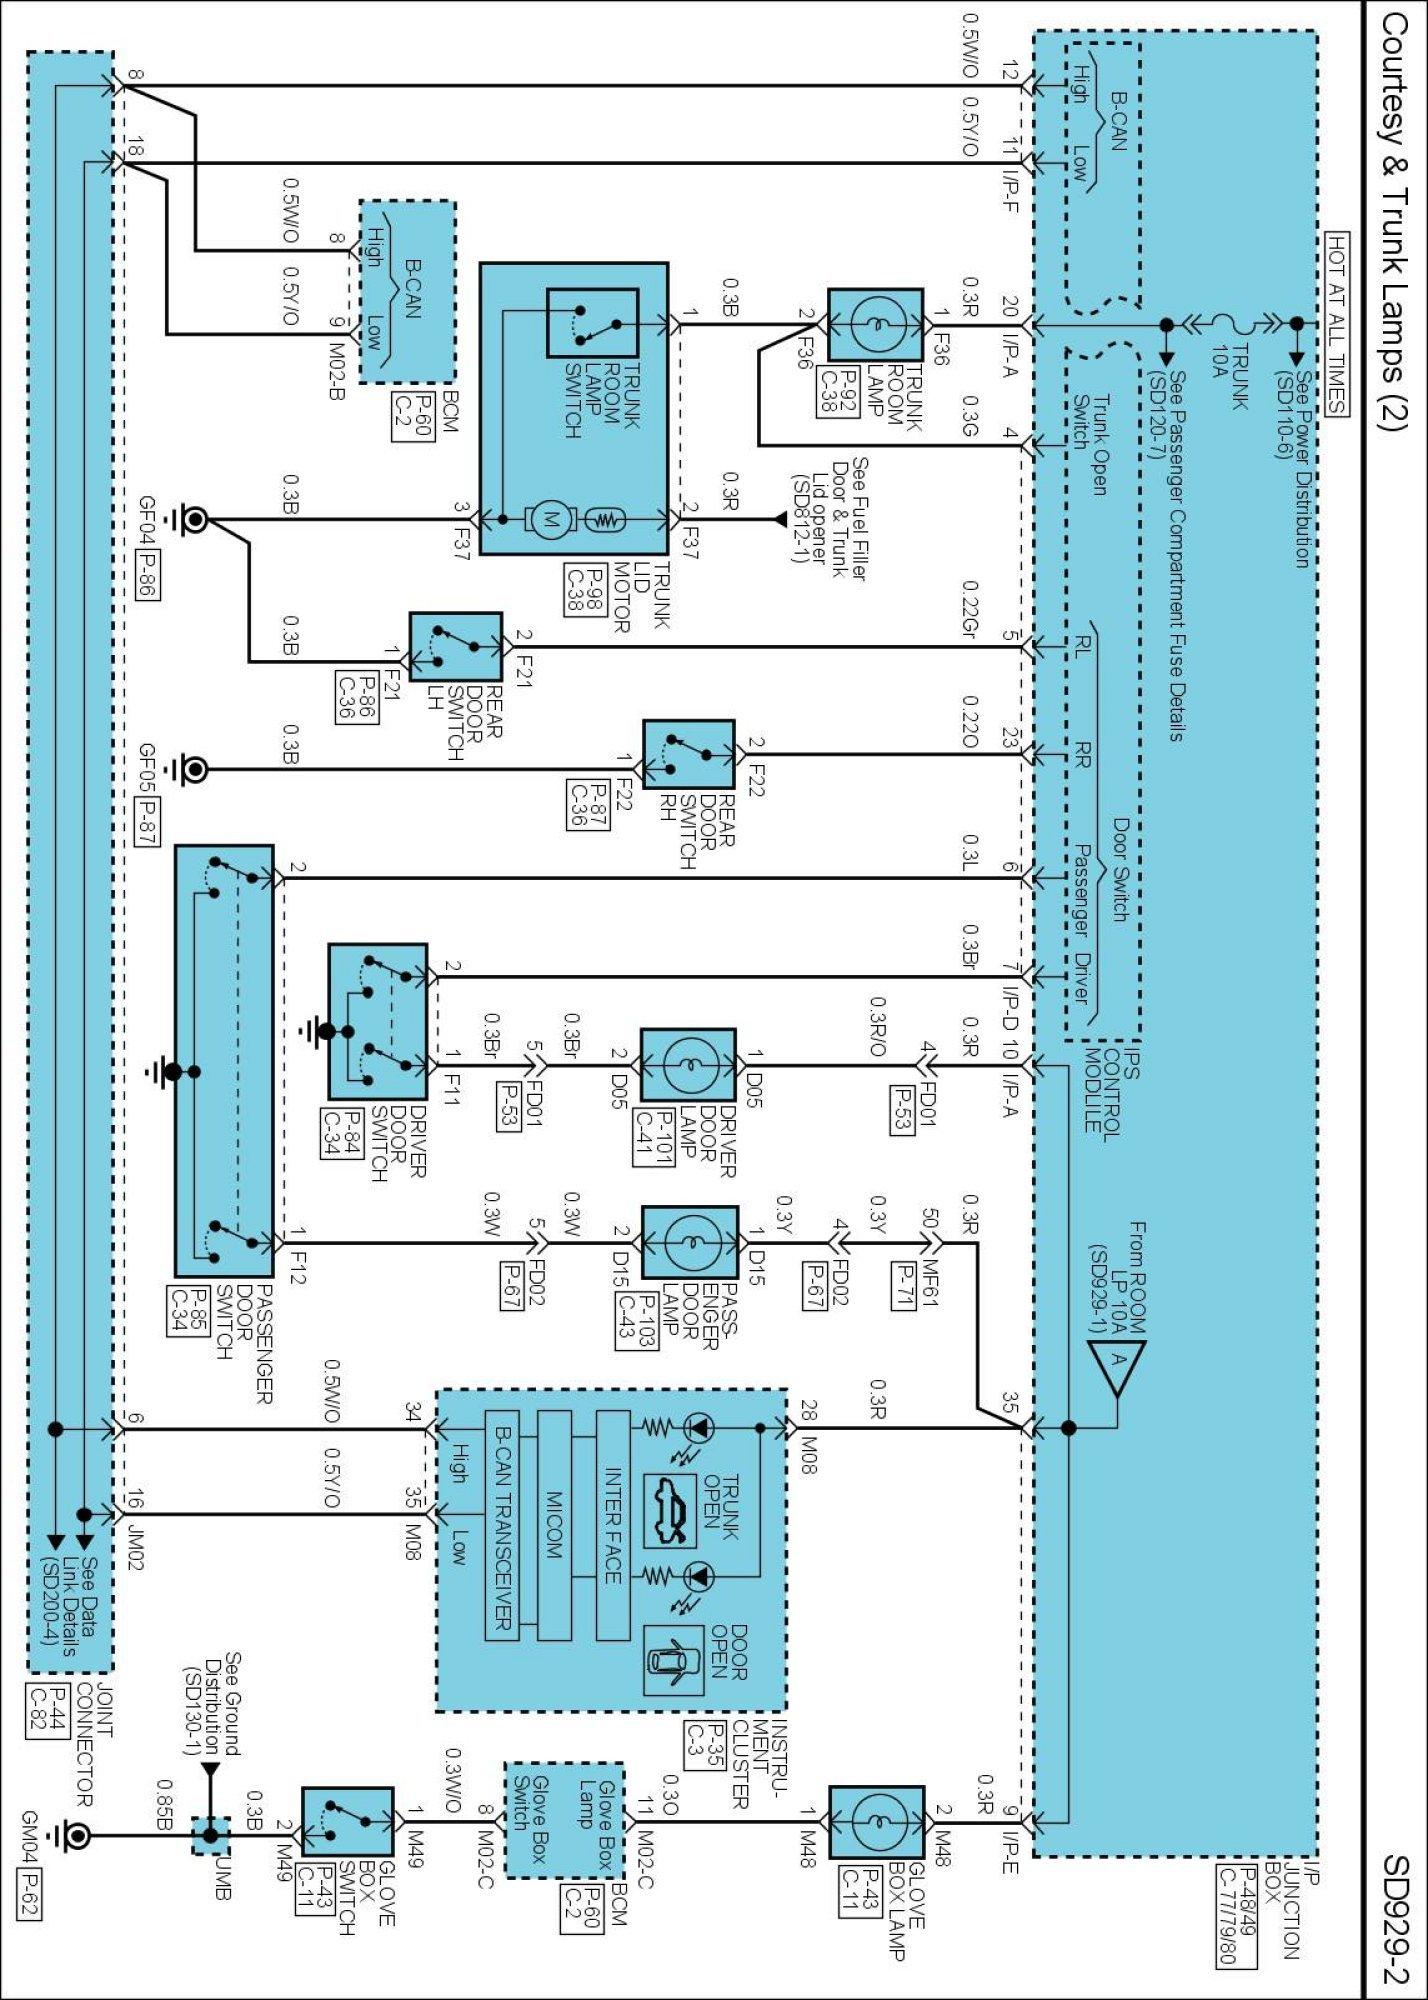 Hyundai Radio Wiring Harnes Diagram